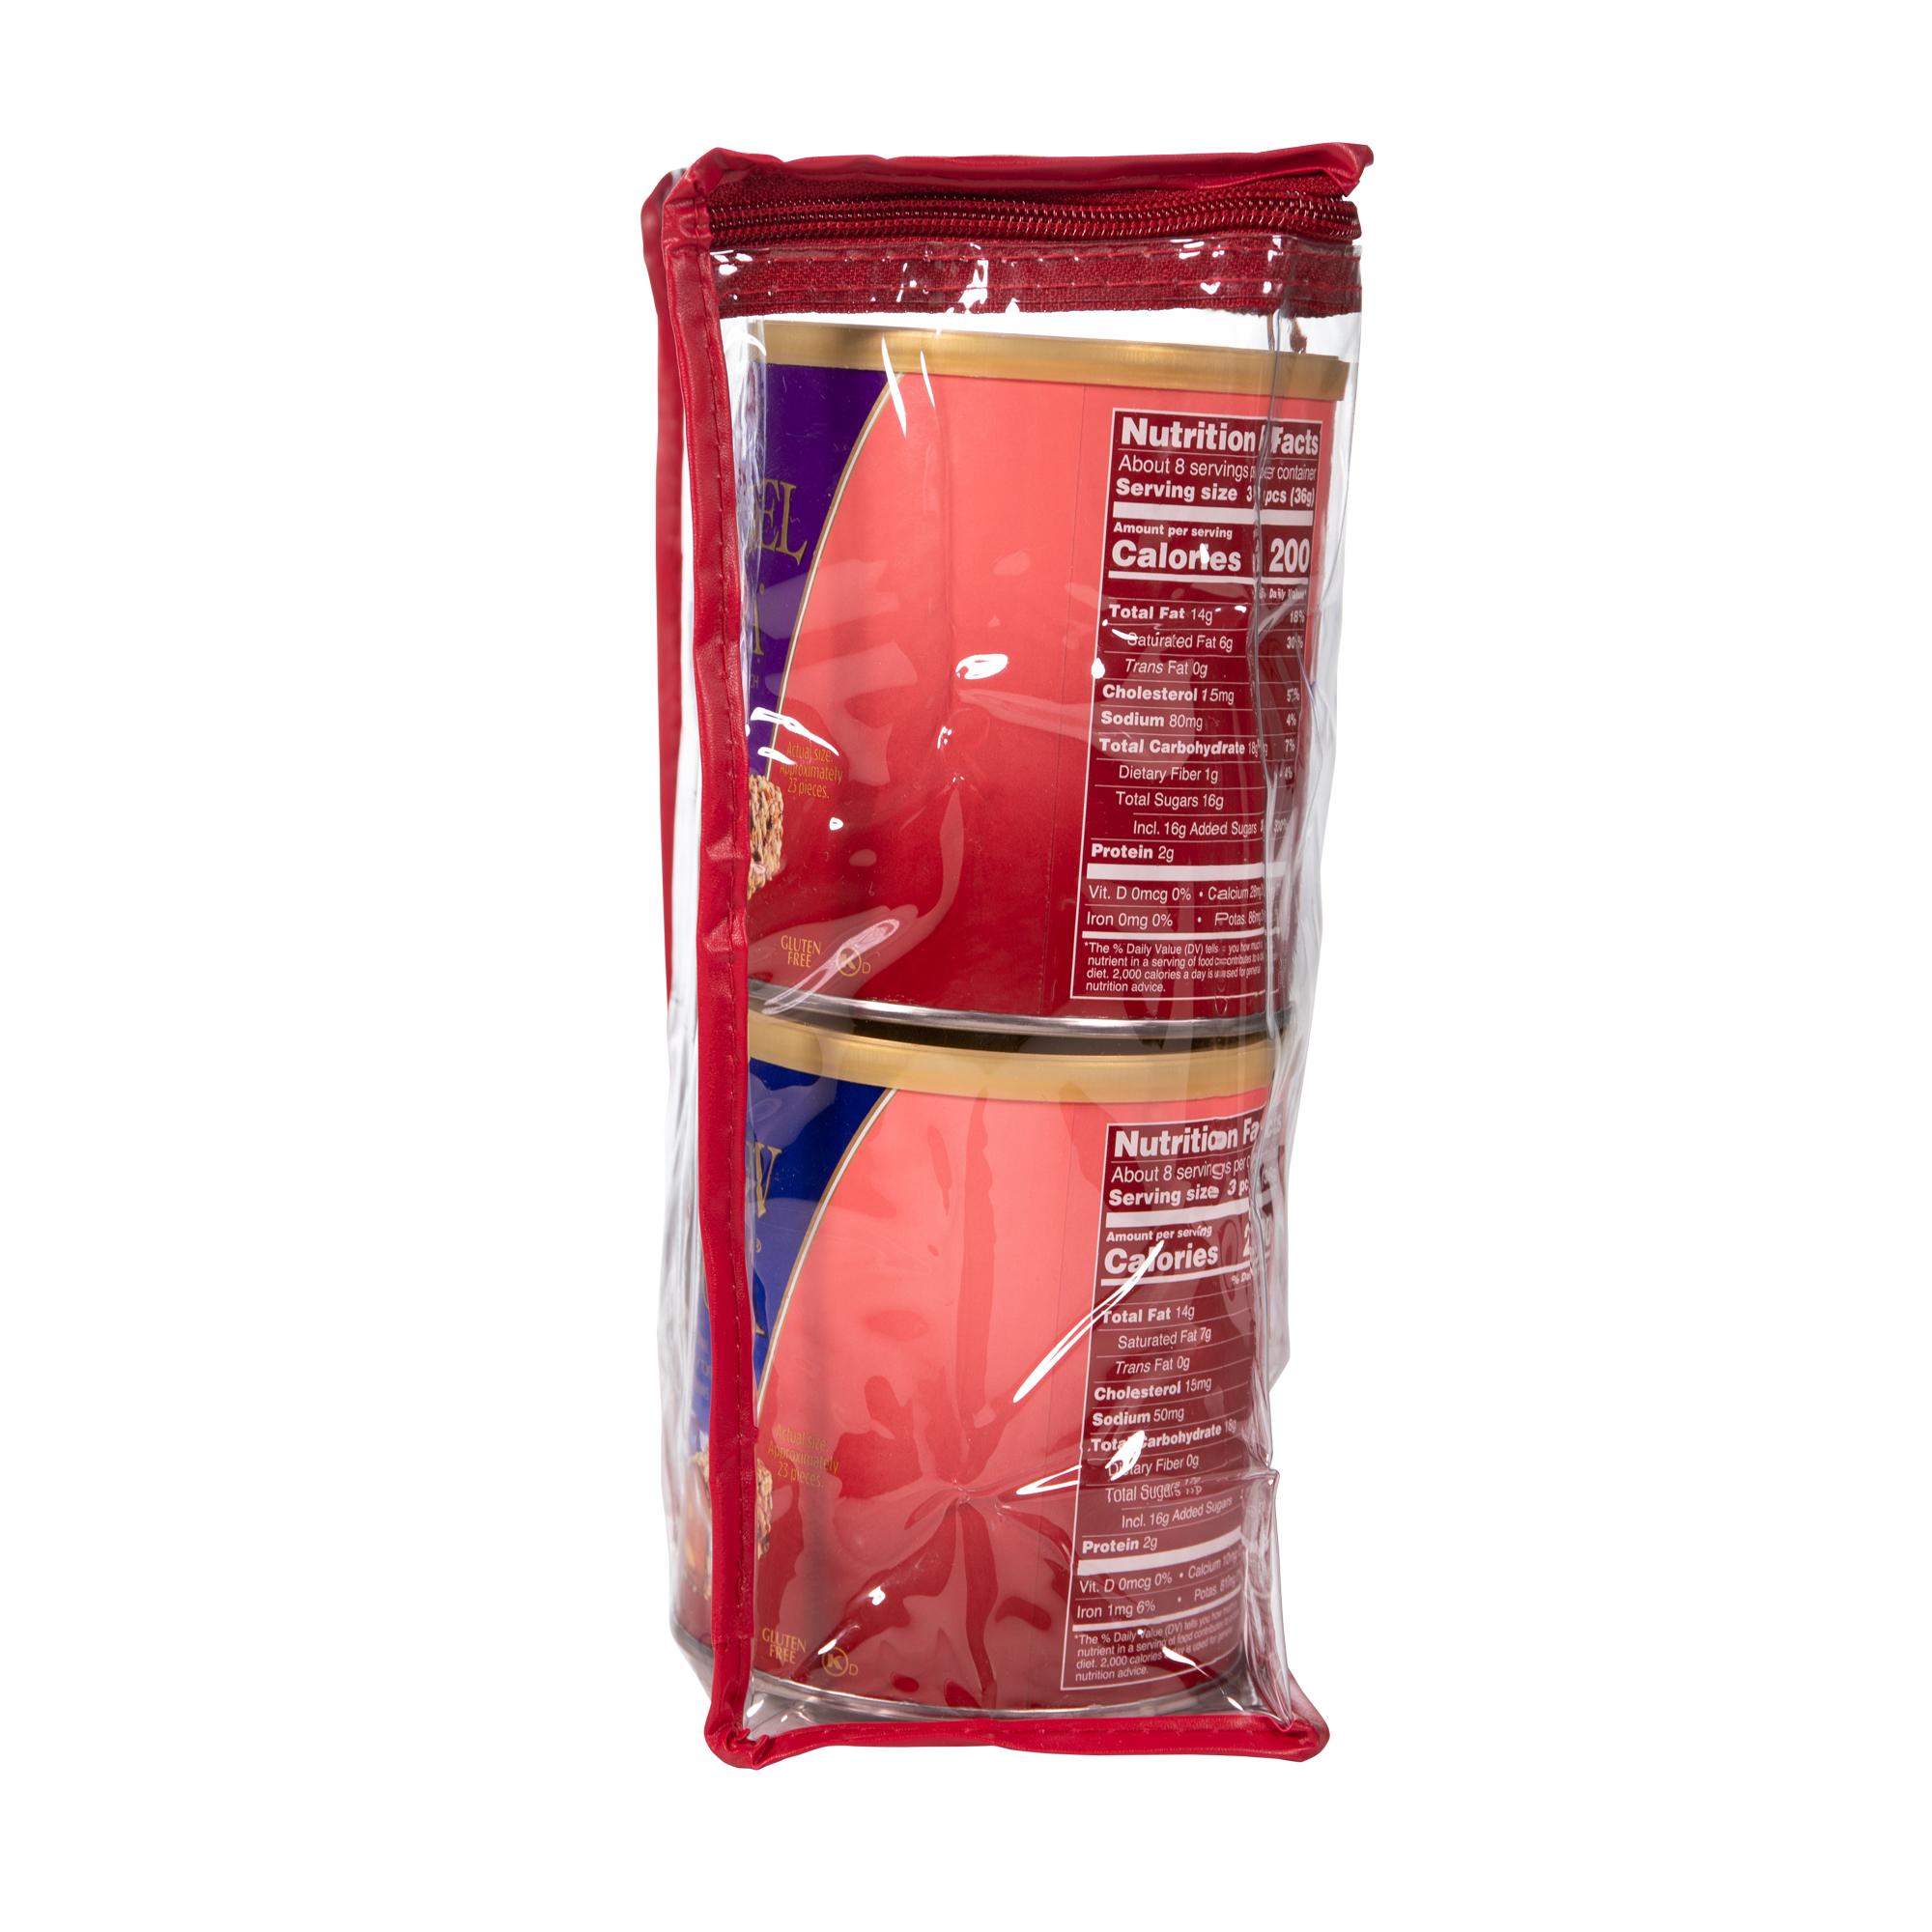 0675 40 oz Four Flavor Tote: ALMOND ROCA®,SEA SALT CARAMEL ROCA®, DARK ROCA®,CASHEW ROCA® - Right-side View